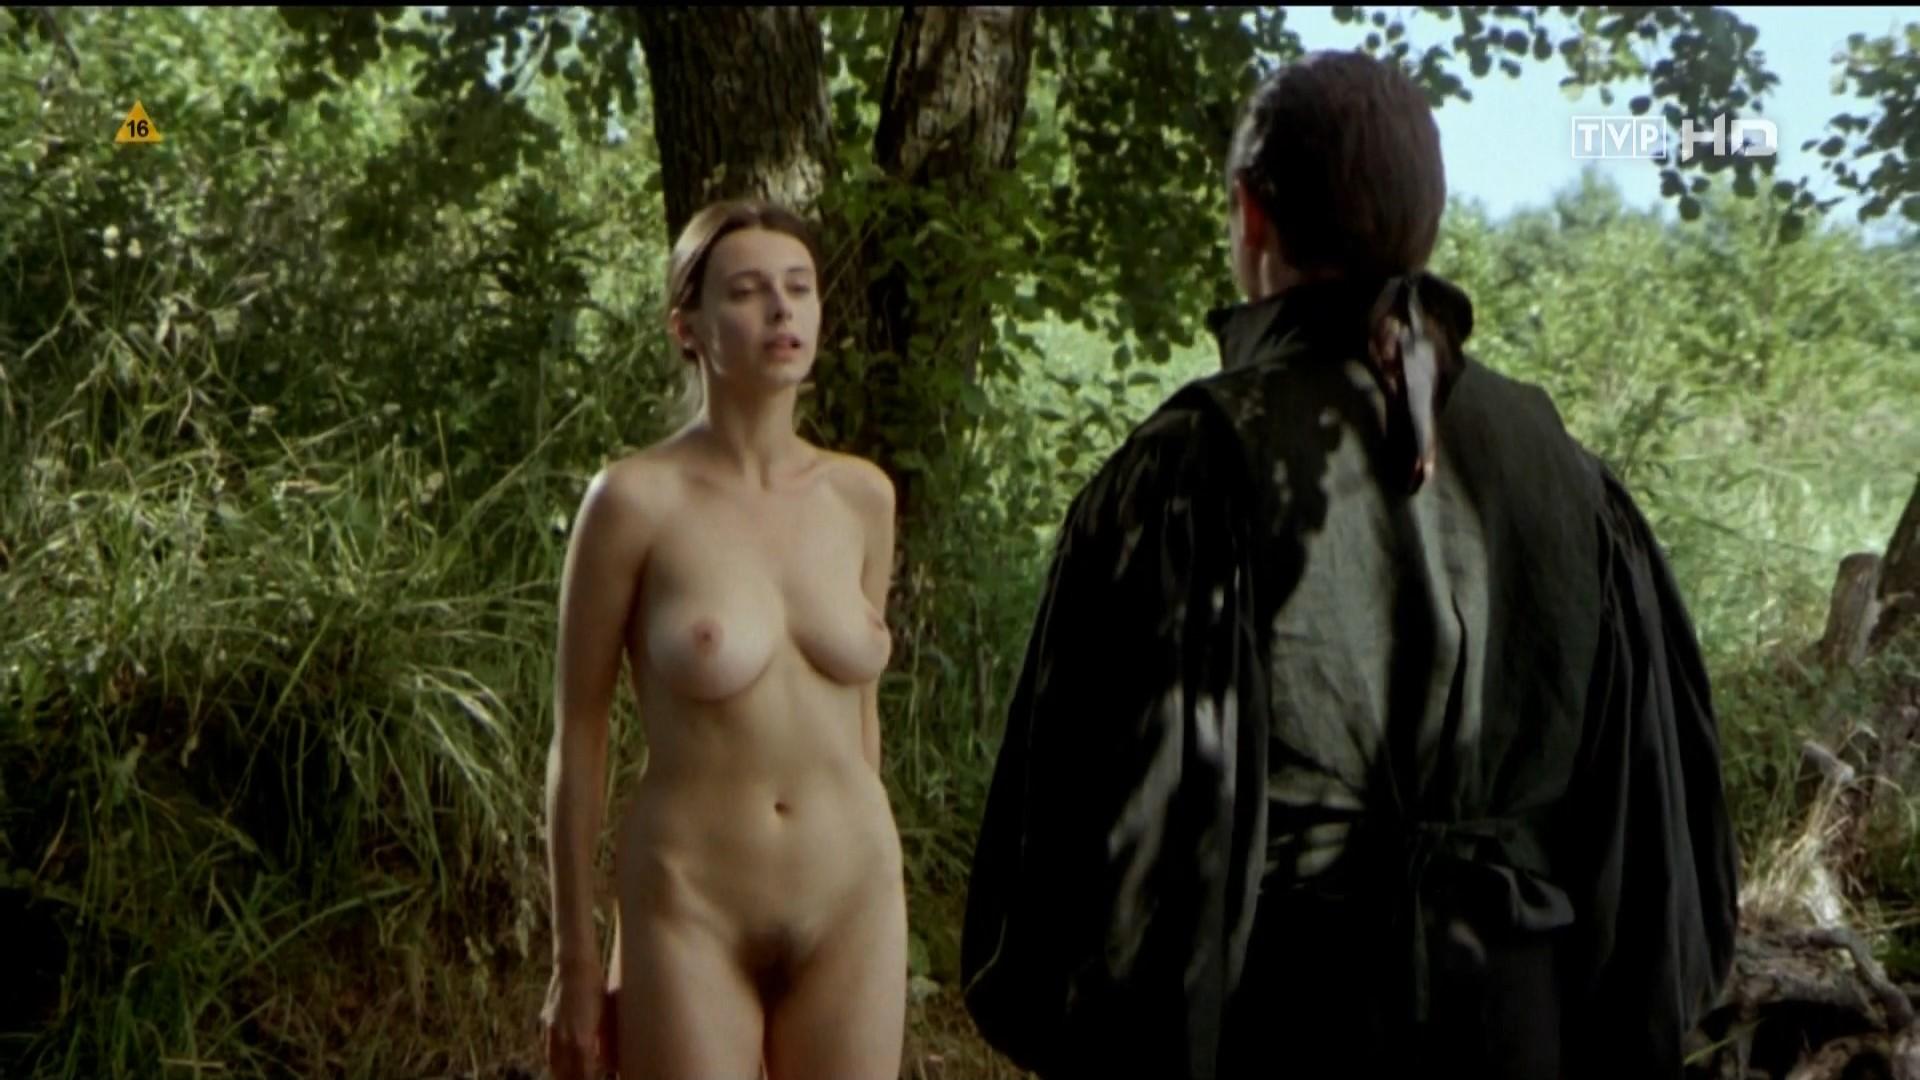 golie-devushki-filmi-smotret-prelesti-krasotok